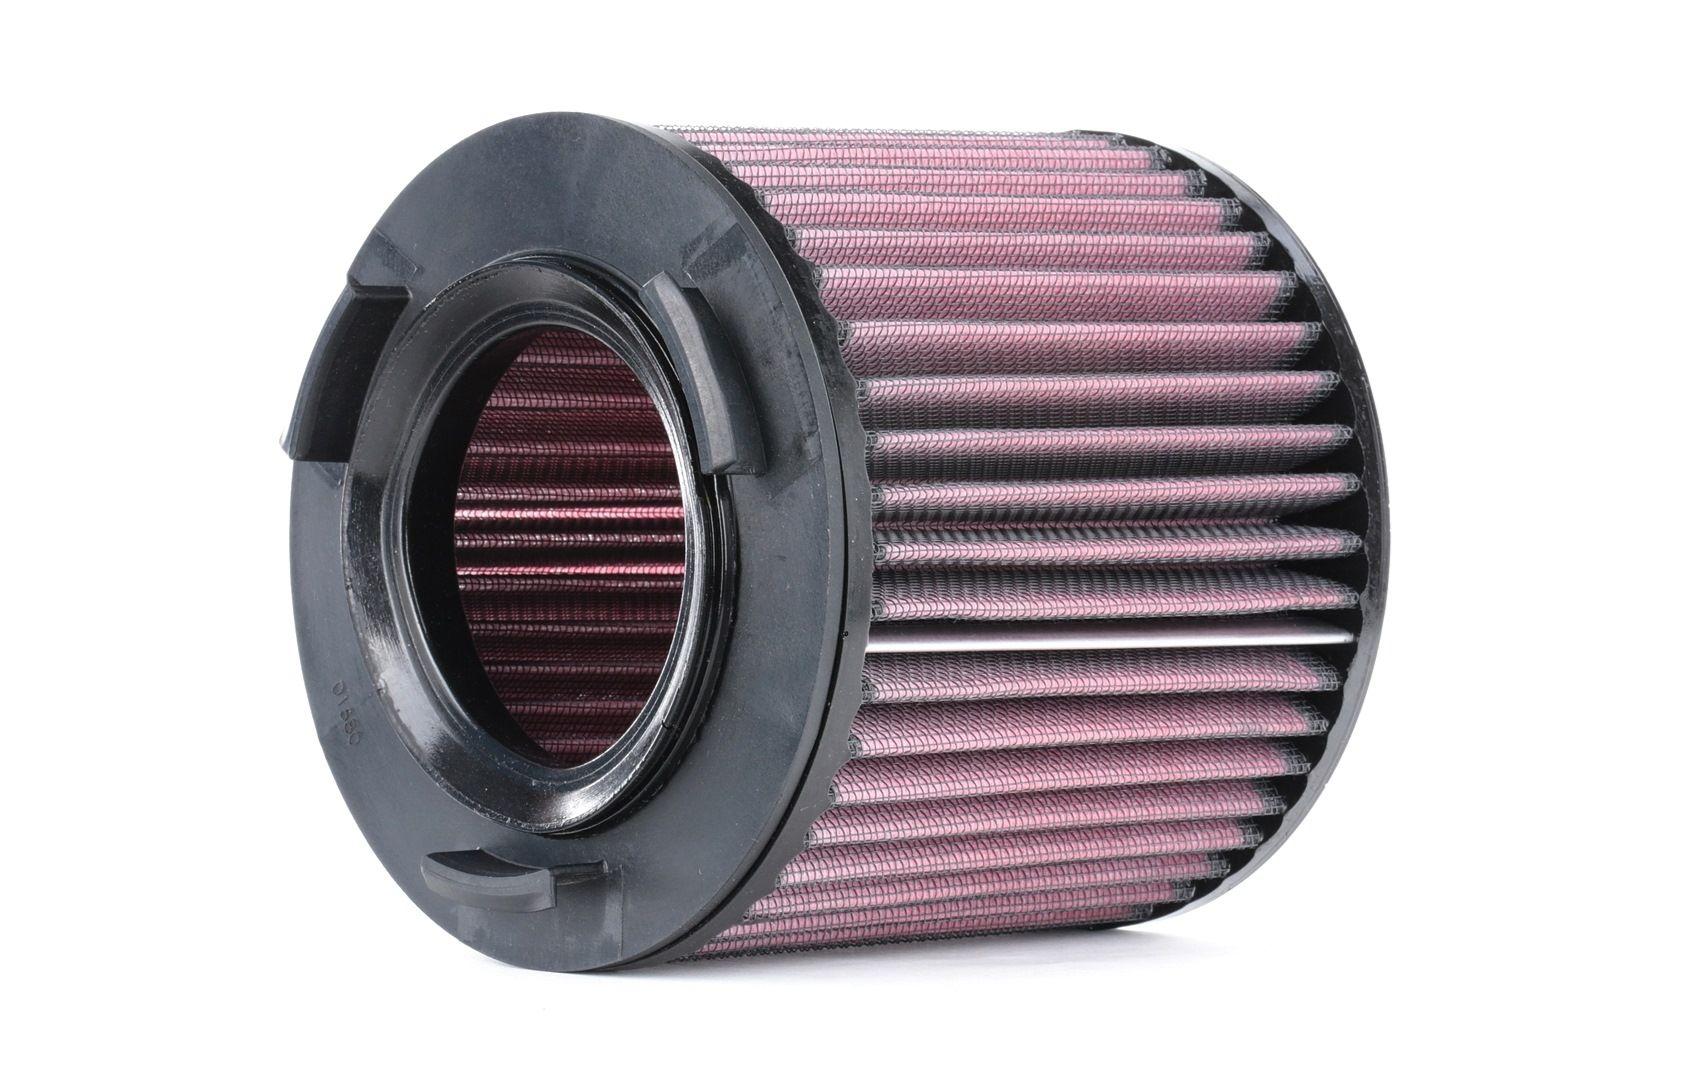 K&N Filters: Original Luftfilter E-2997 (Länge: 143mm, Länge: 143mm, Breite: 76mm, Höhe: 129mm)